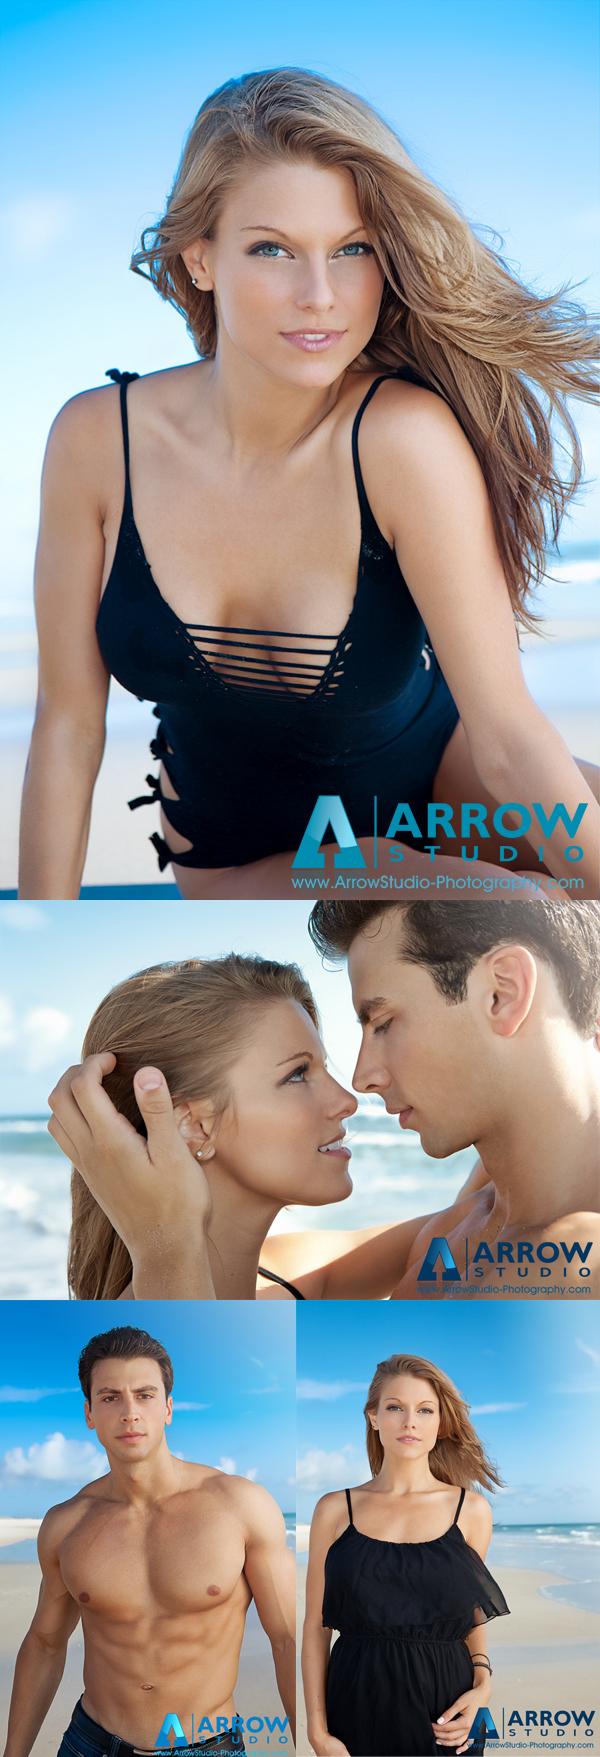 Florida Aug 17, 2012 Arrow Studio Adam and Meghan